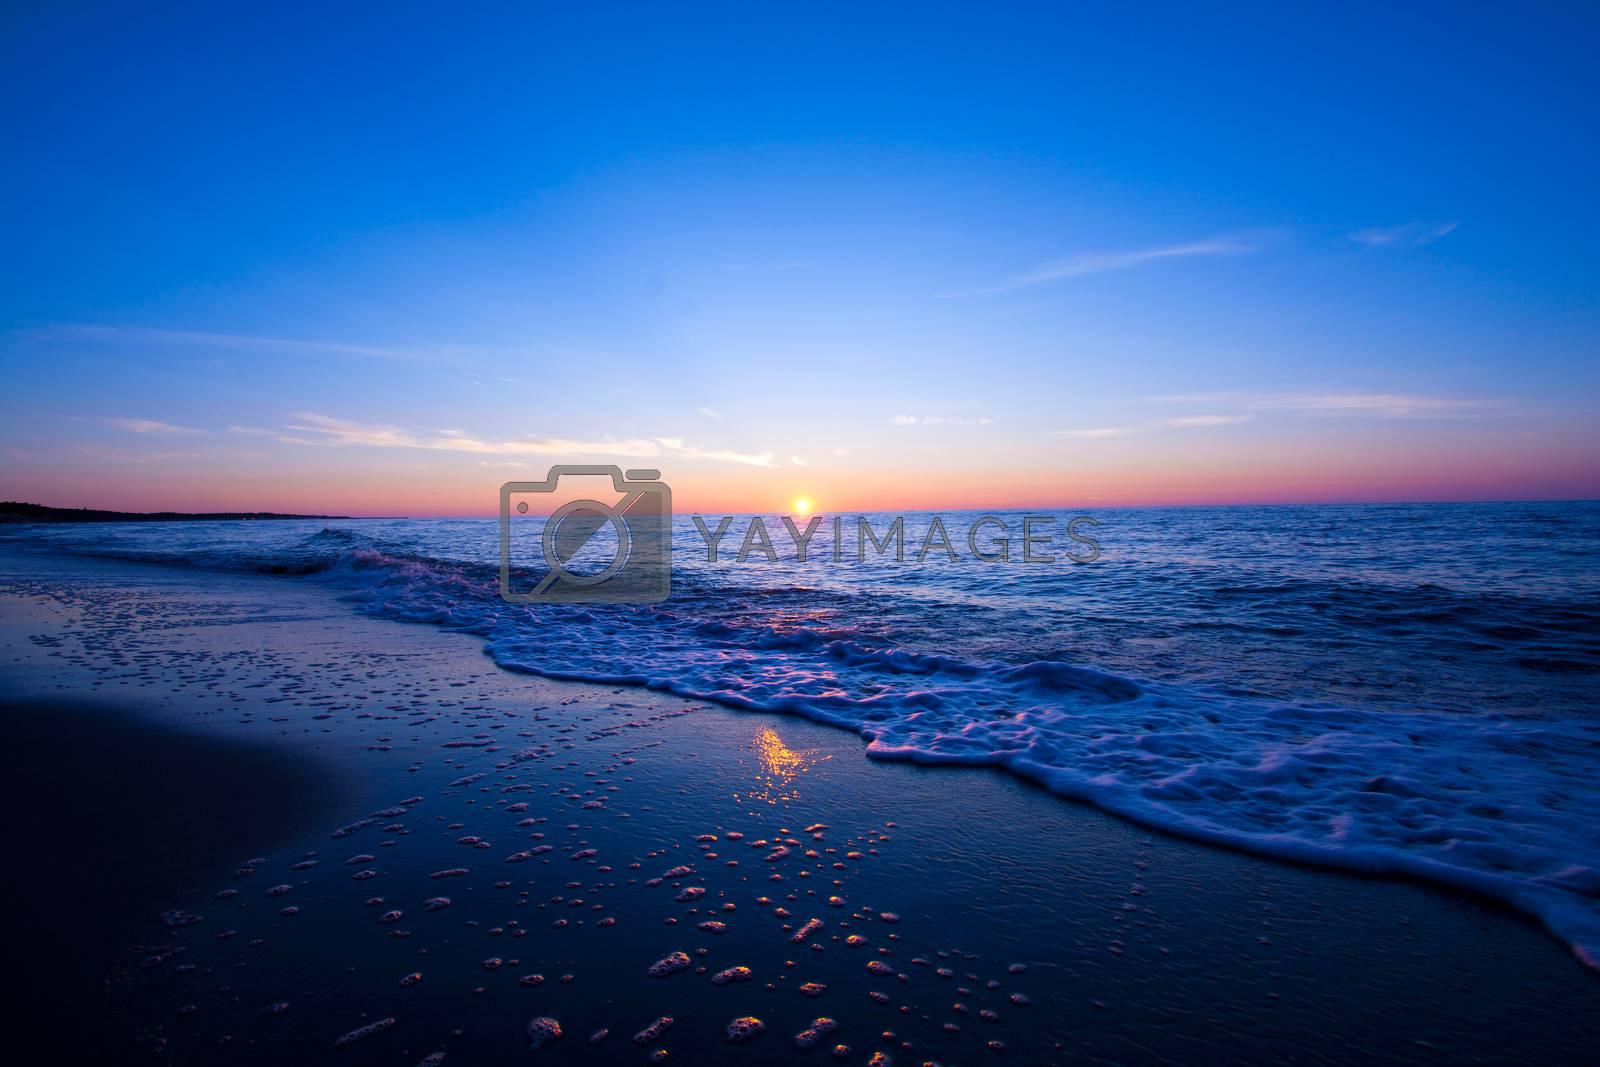 Sunset over sea. Blue nature fantasy marine landscape.